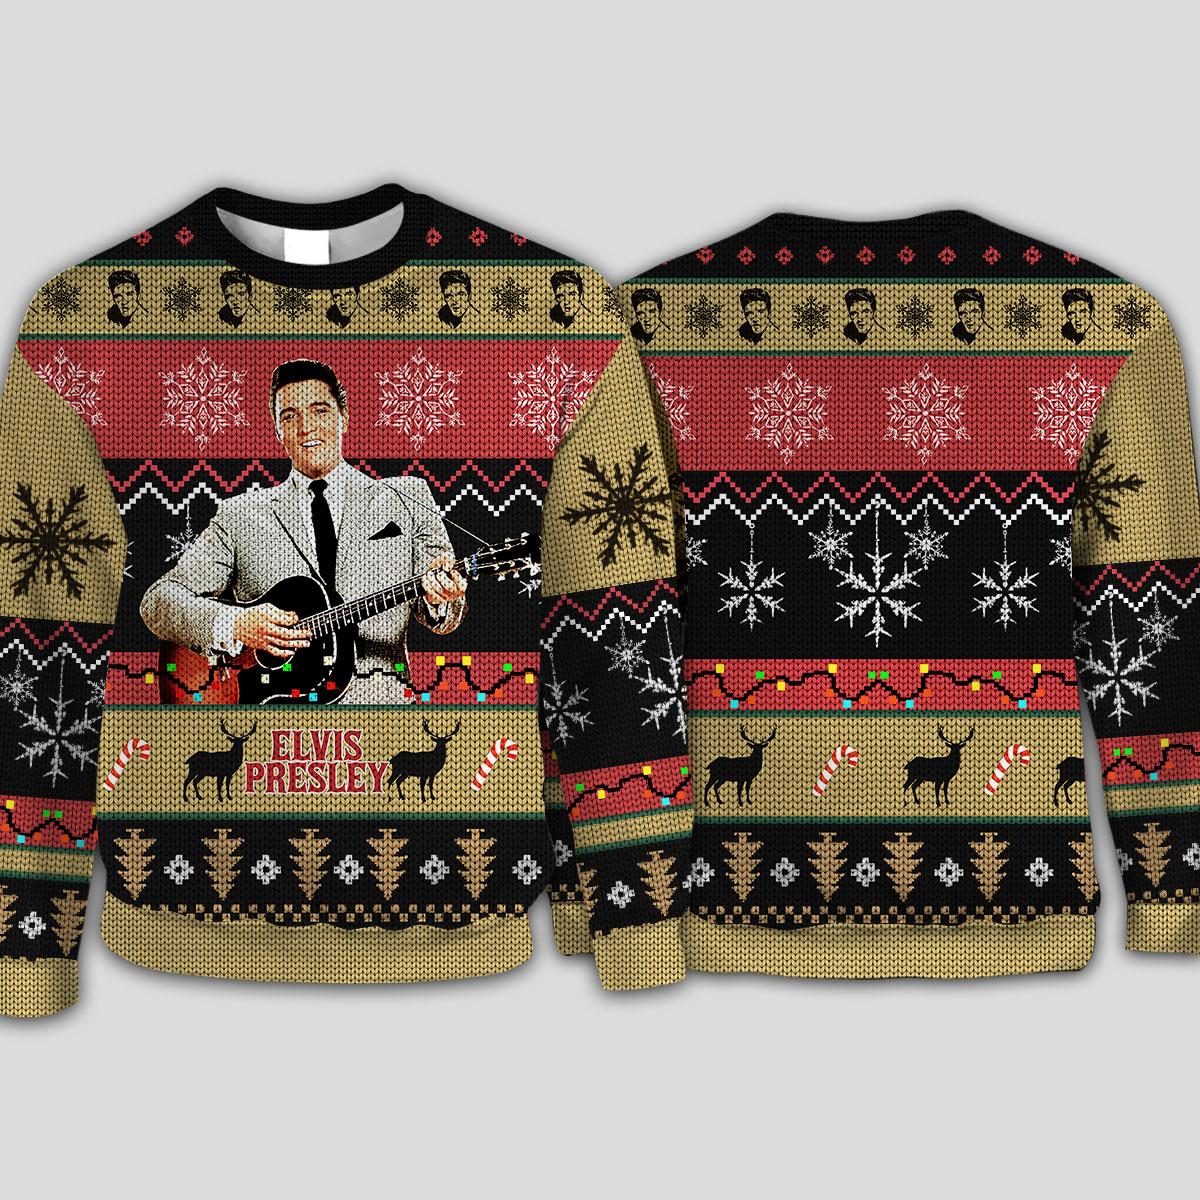 Elvis presley knitting pattern all over print sweatshirt